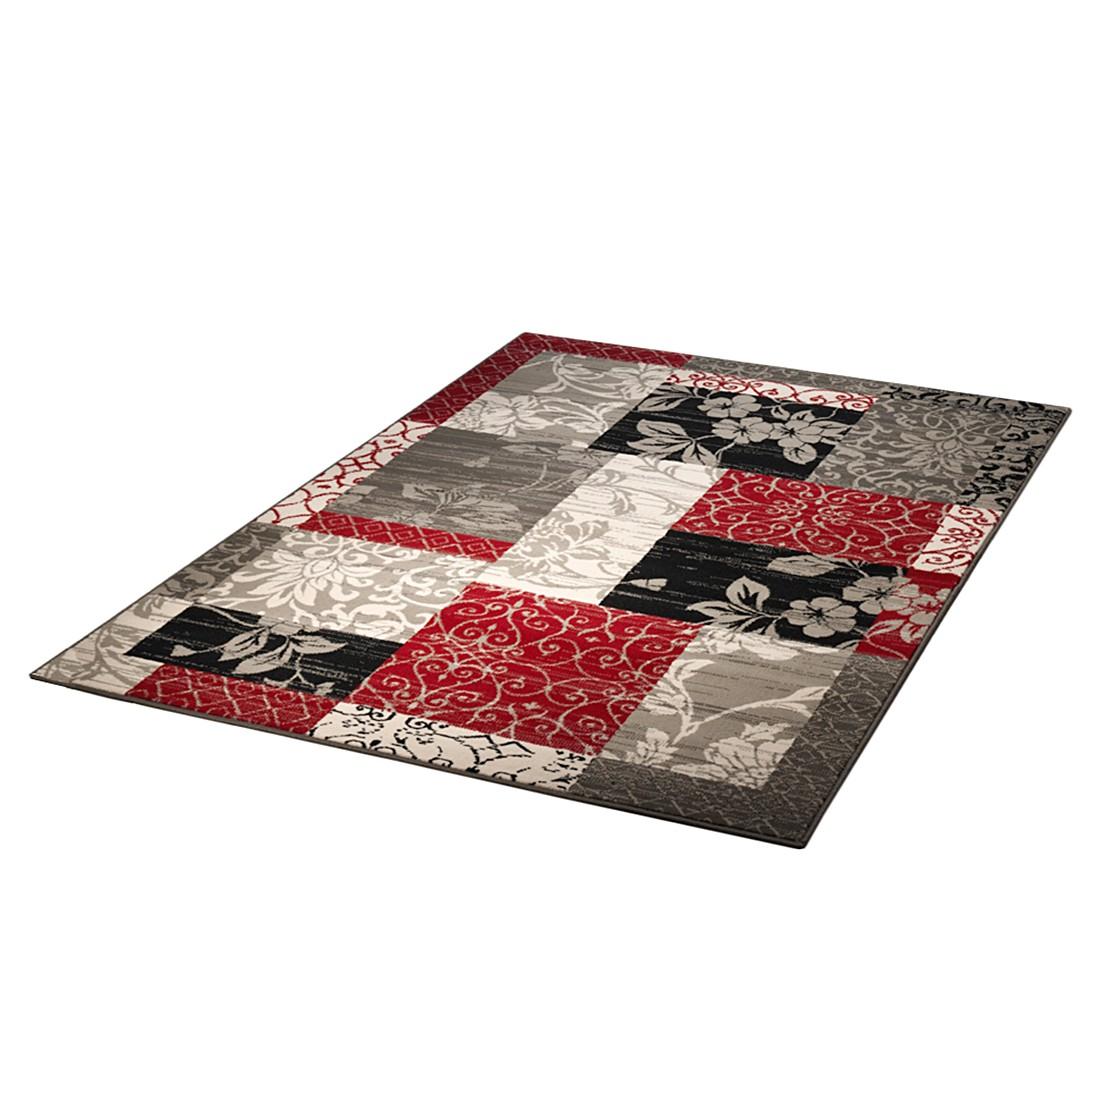 Teppich Rund Rot Grau